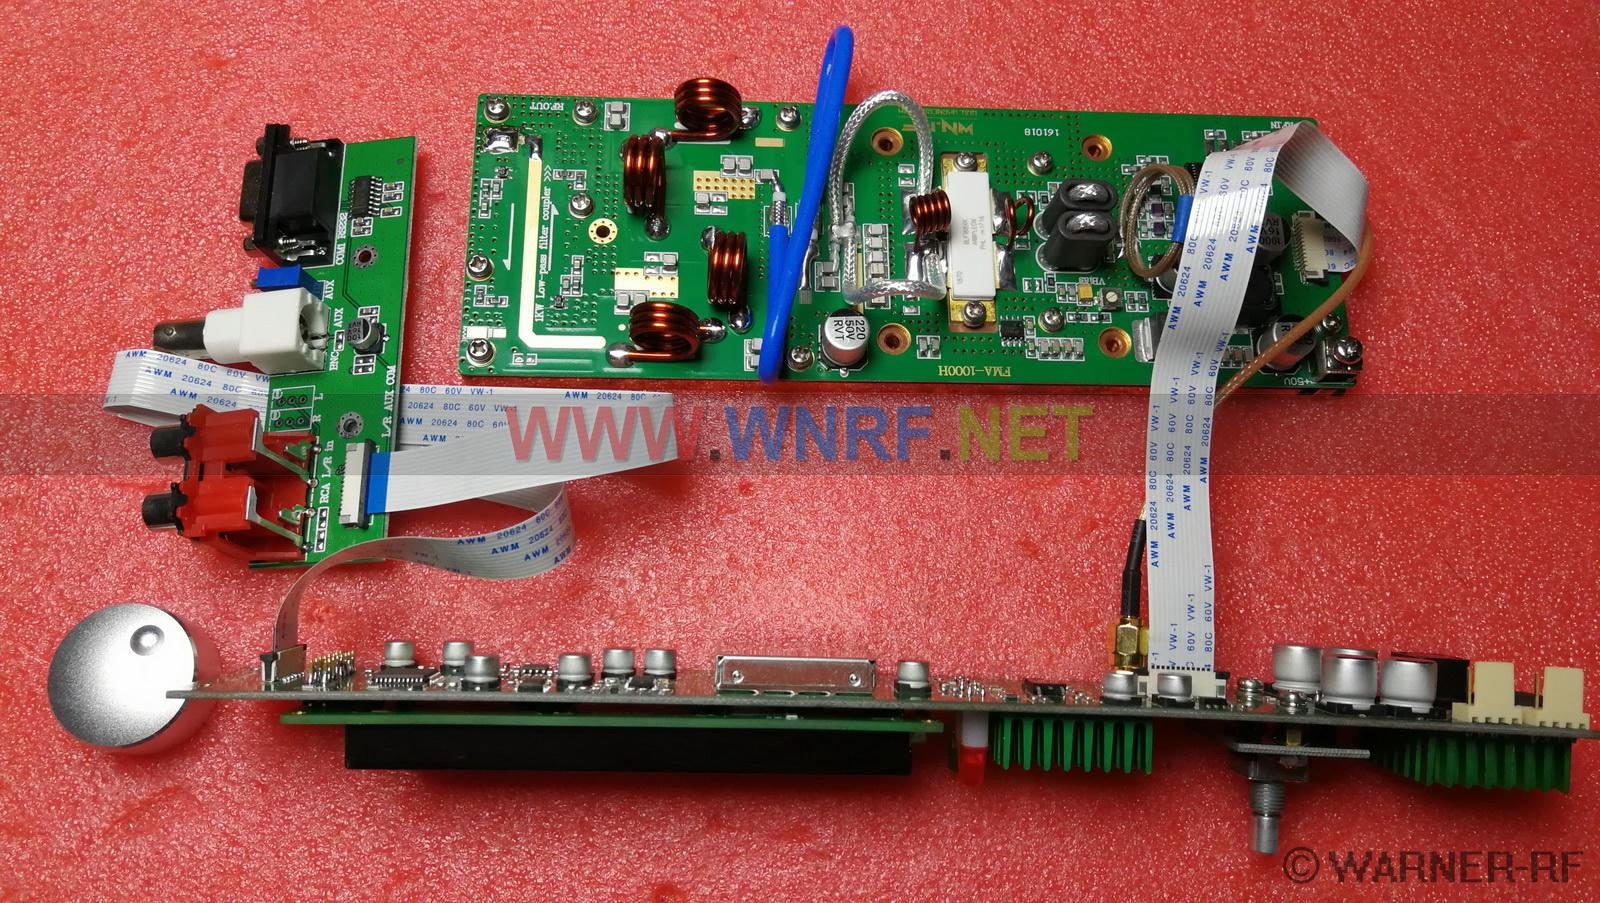 Fma 1000h 1000w Fm Stereo Broadcast Transmitter Pcb Kits 1w Circuit